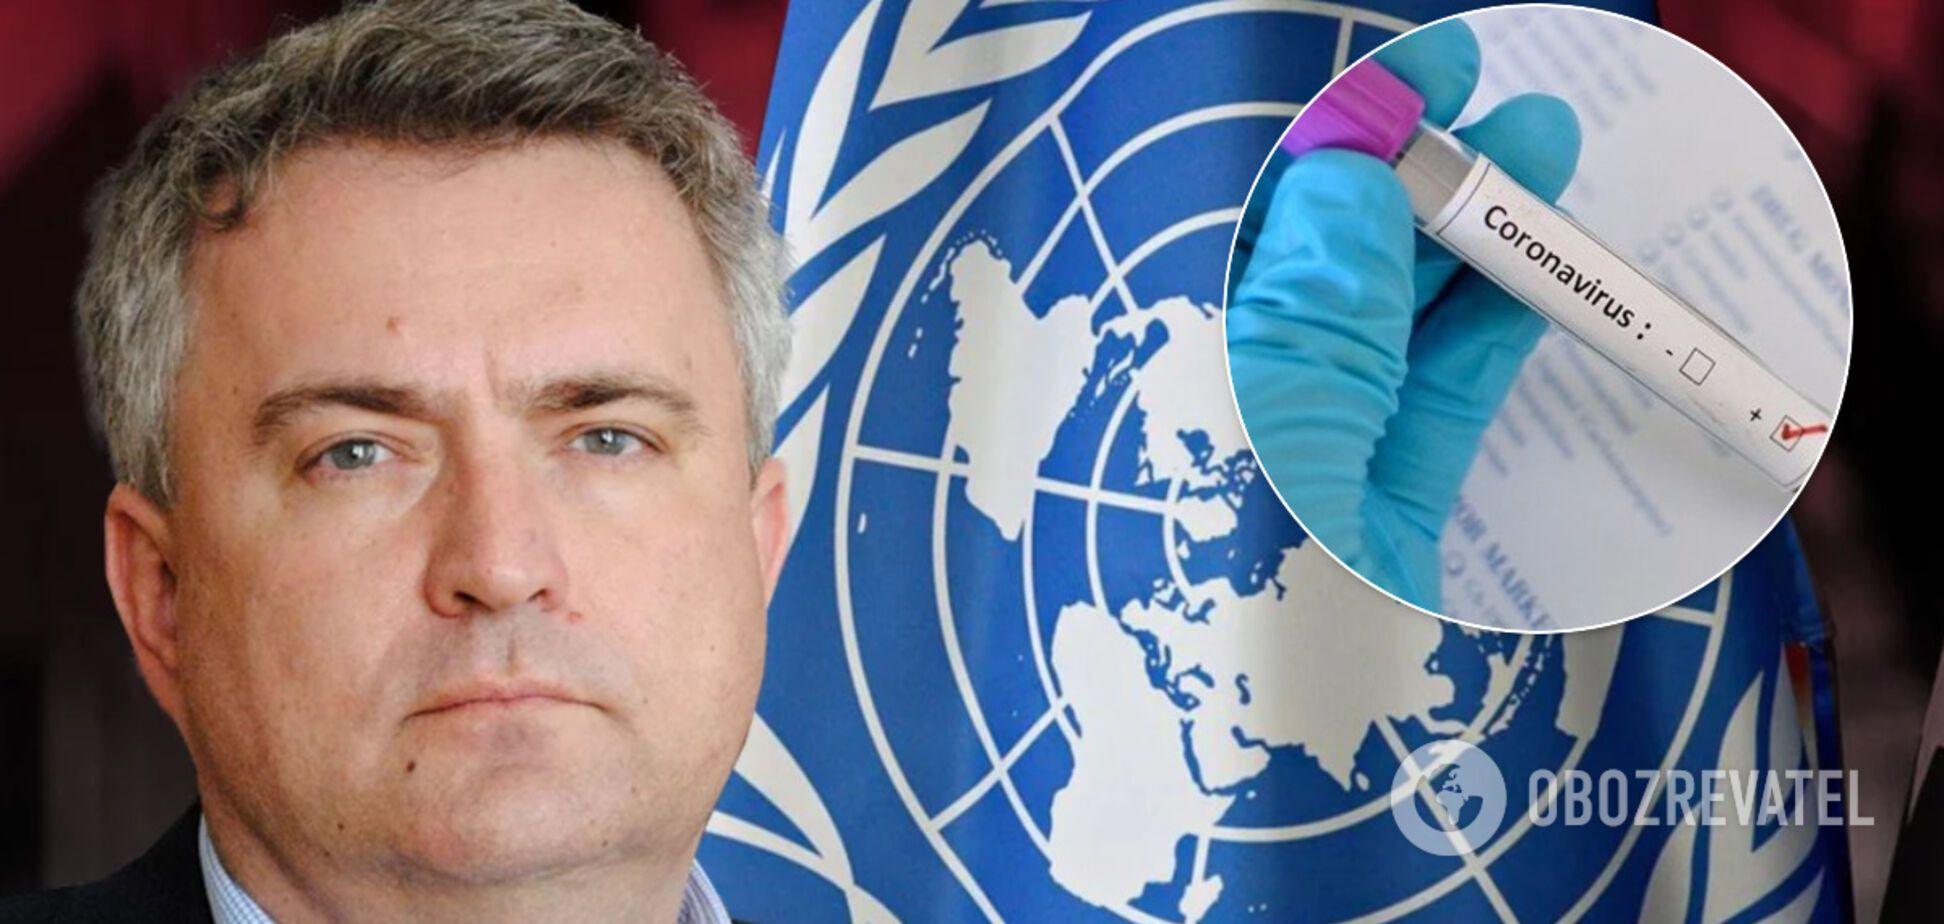 ООН и ВОЗ дадут Украине $58 млн на борьбу с коронавирусом